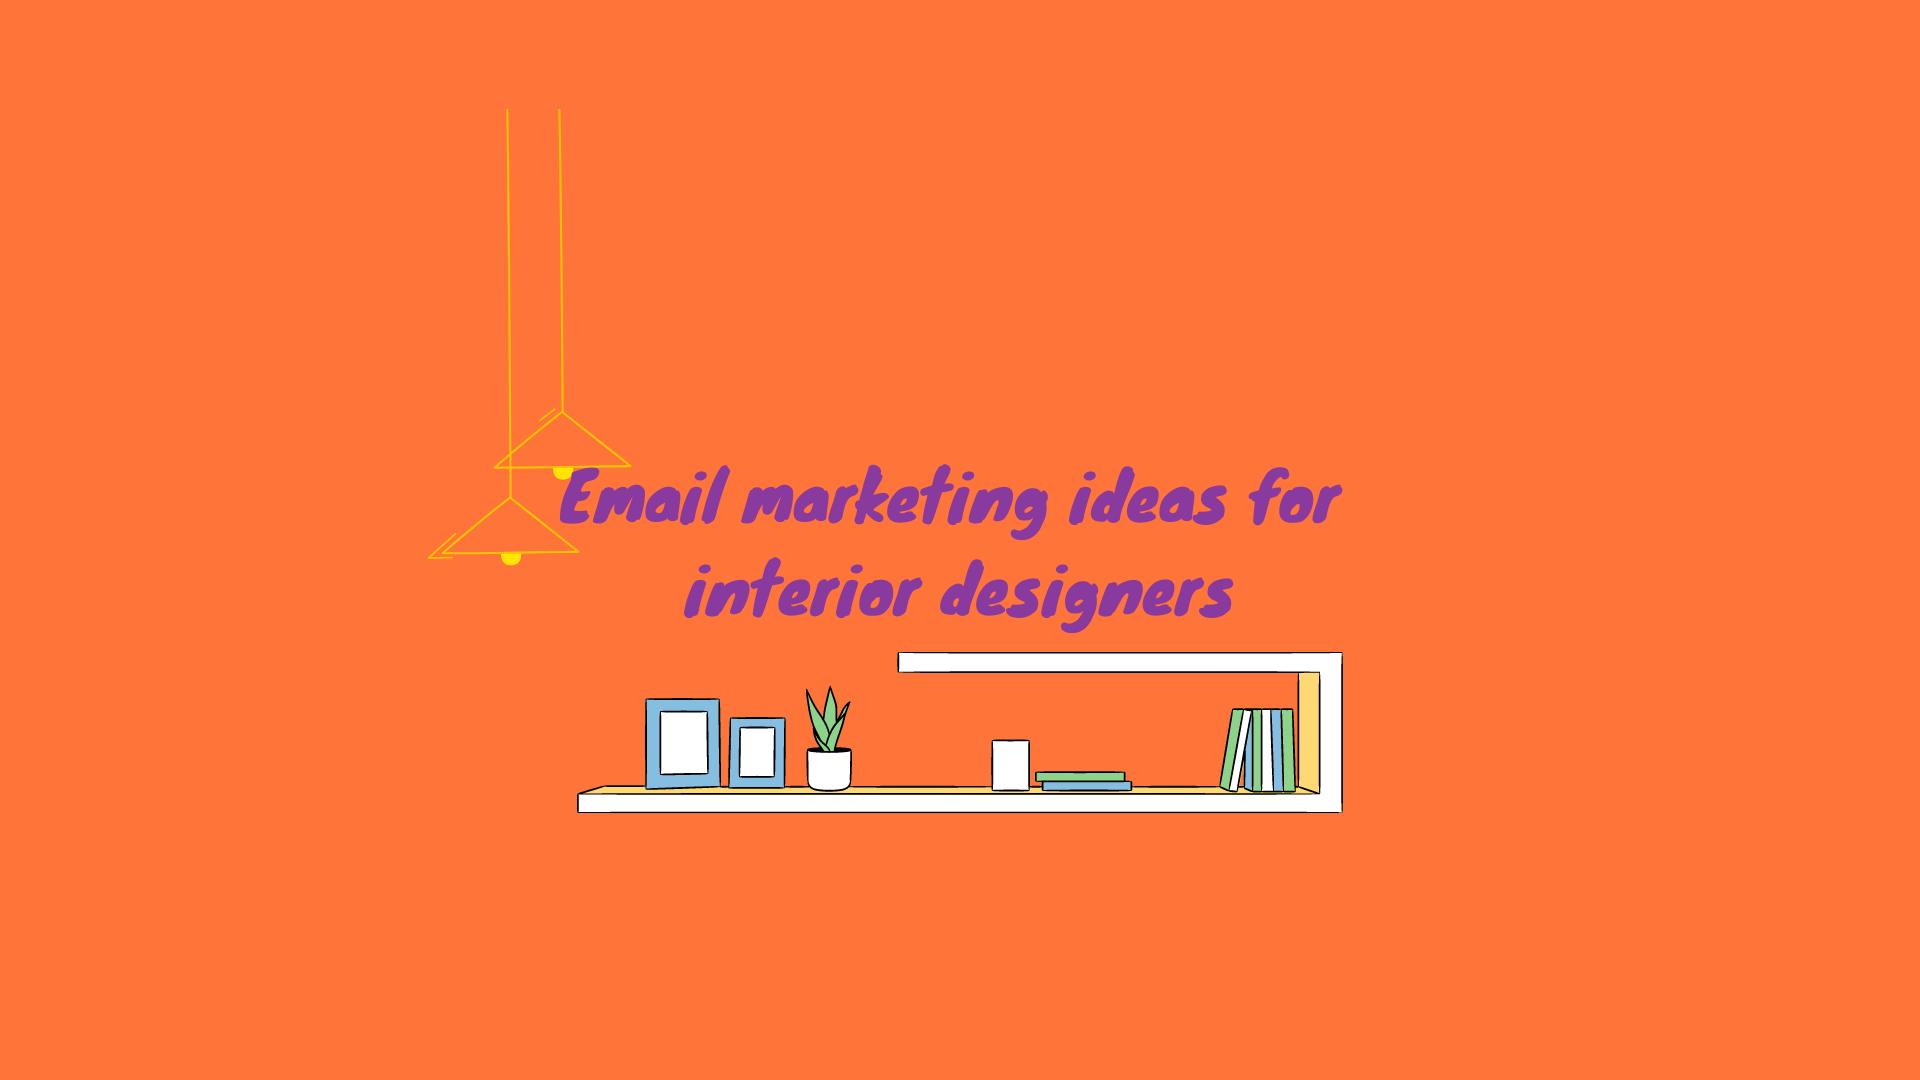 Email marketing ideas for interior designers